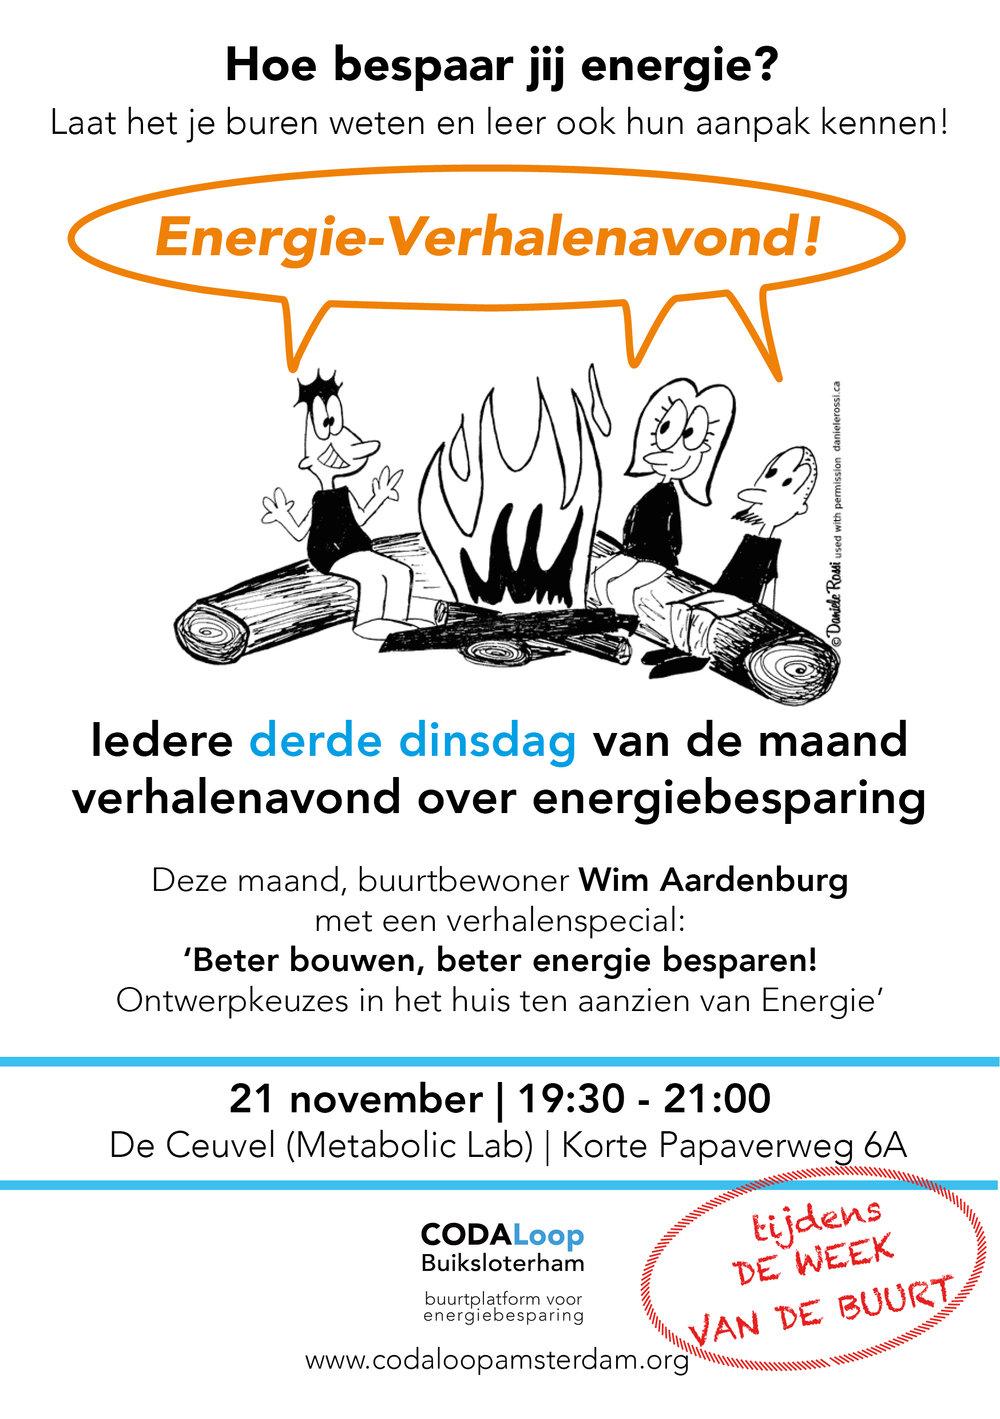 Energie-verhalenavond_De Ceuvel (Metabolic Lab)_2017-11-21.jpg